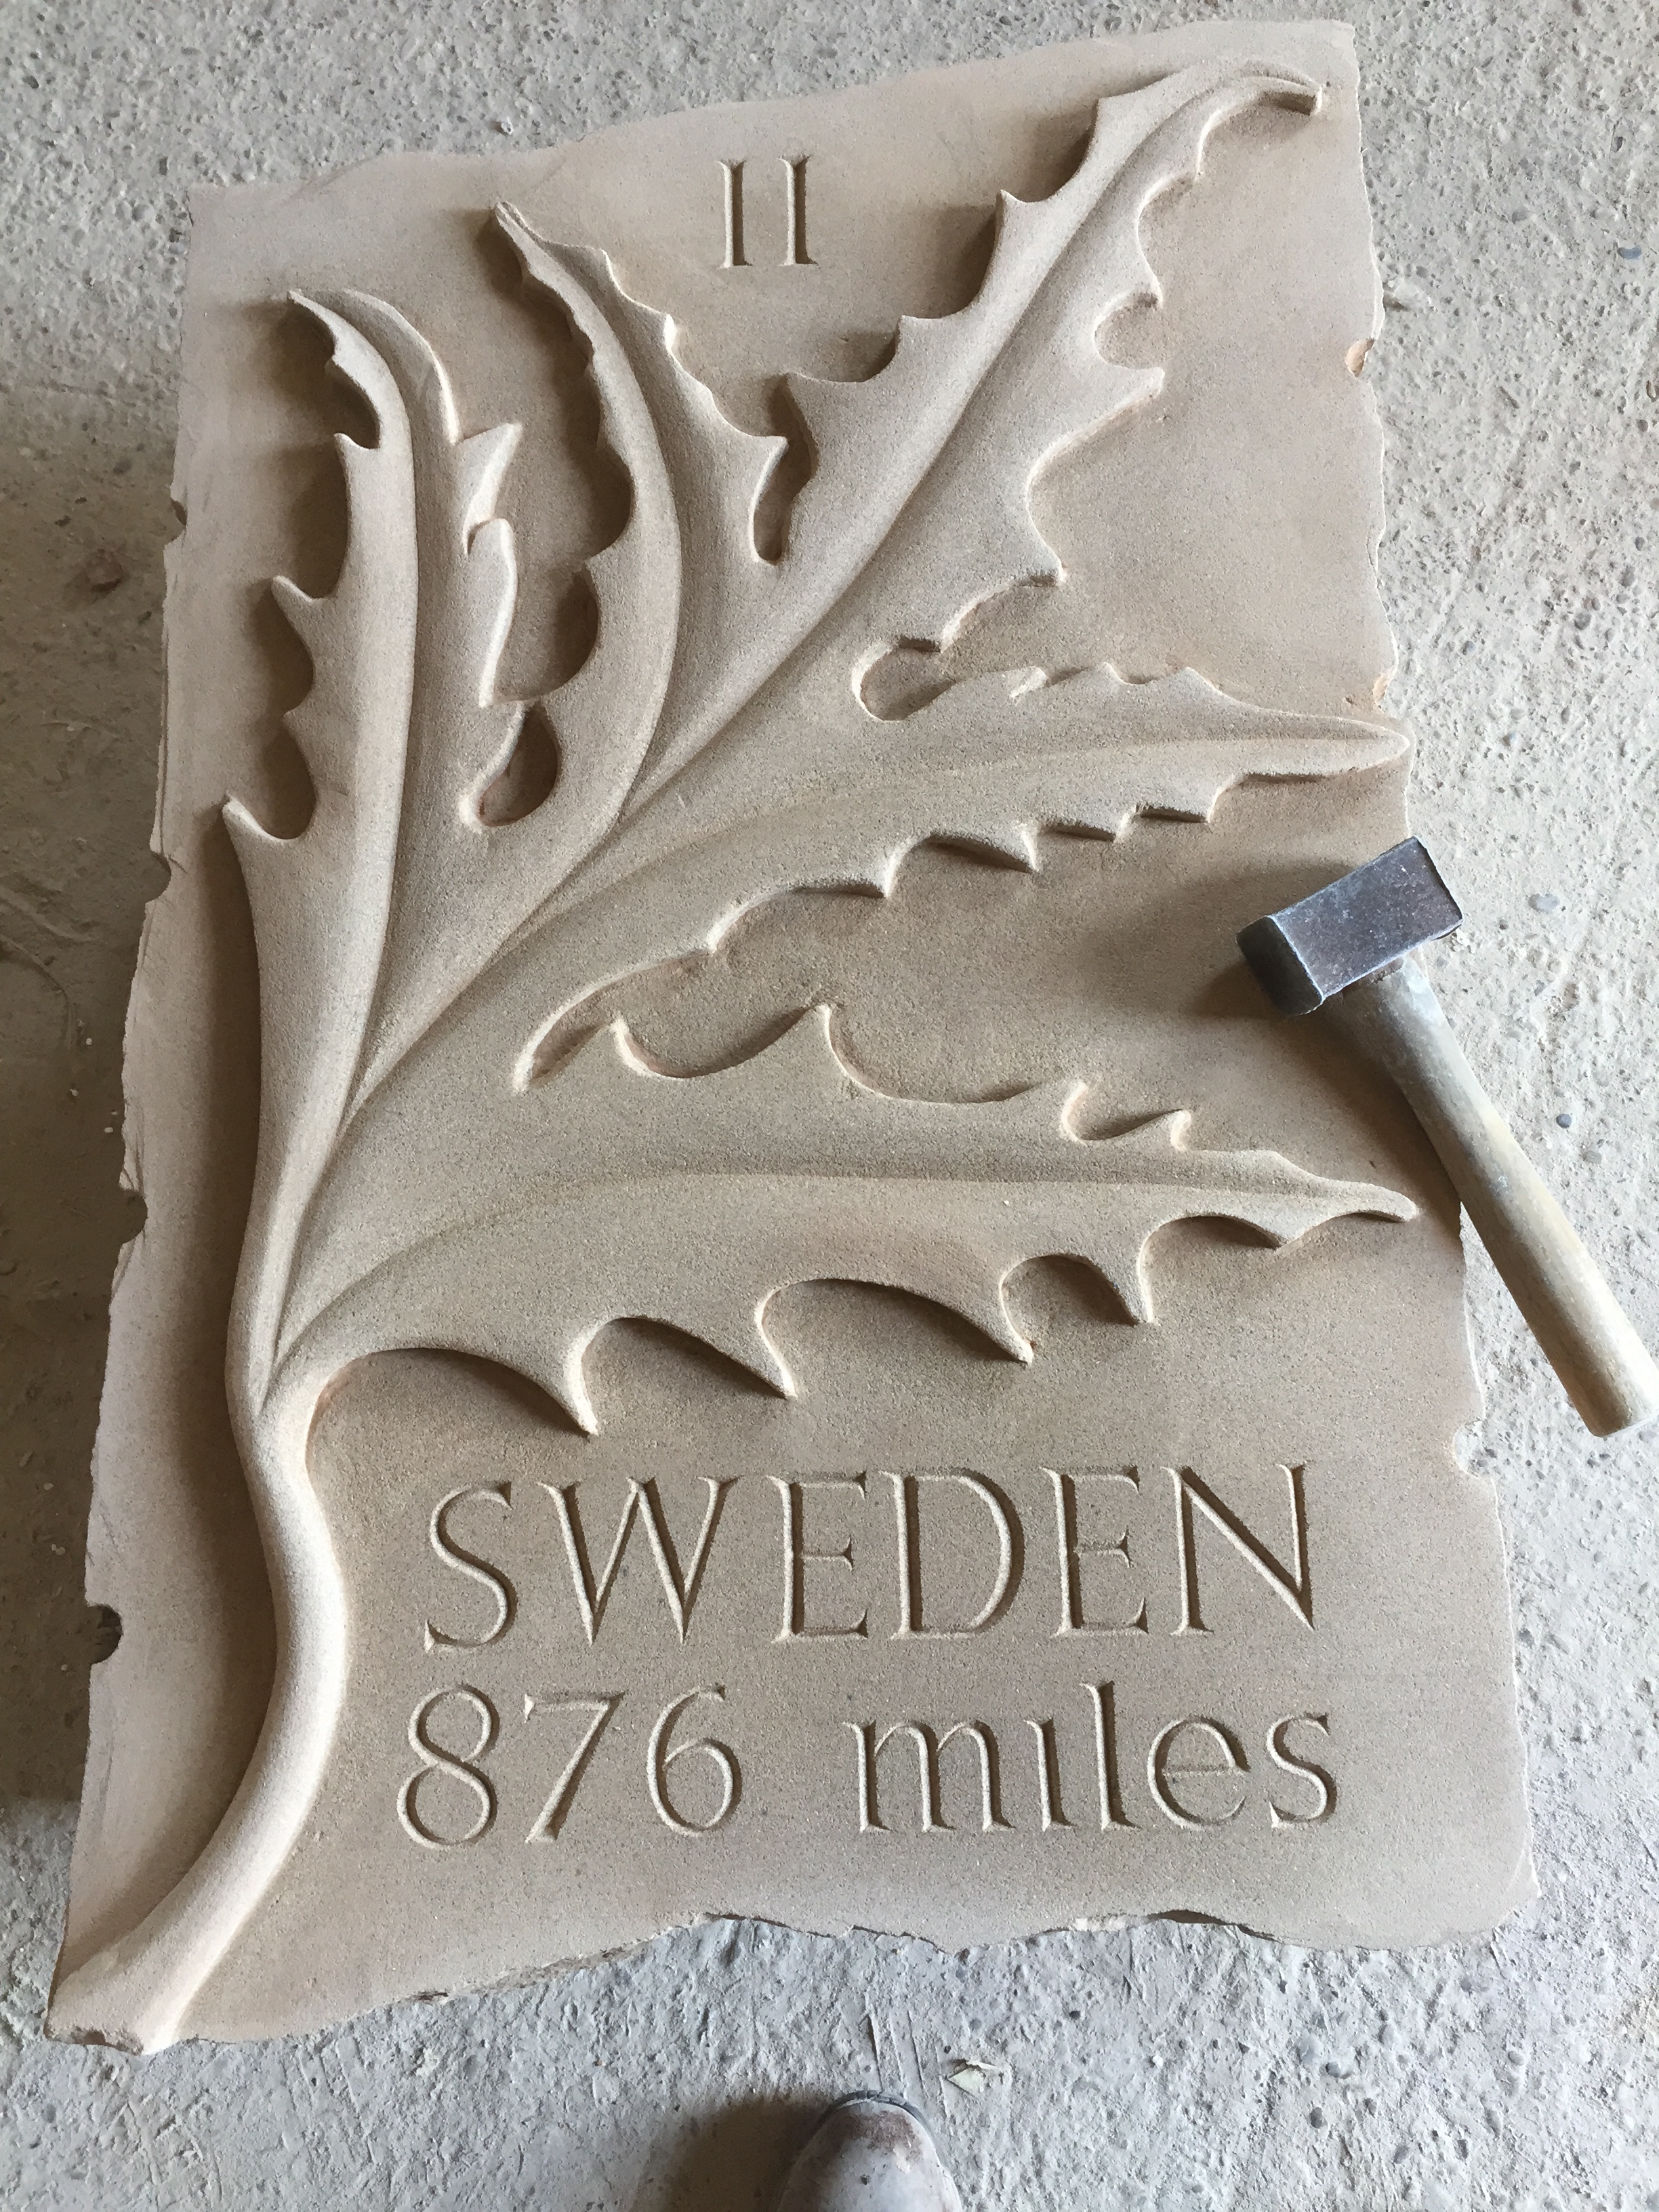 Time for a new sculpture graeme mitcheson stone sculptor